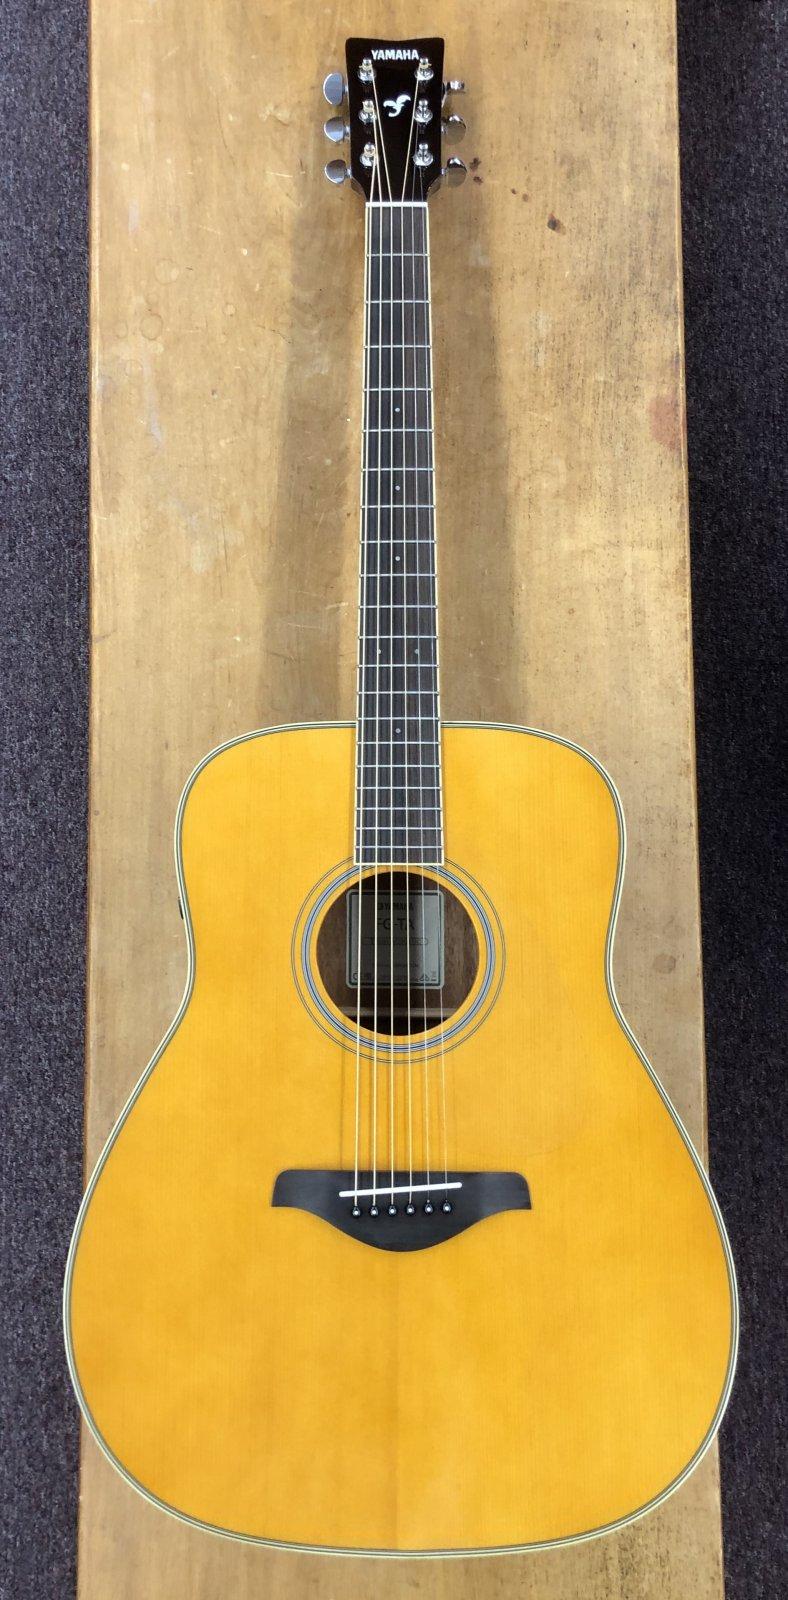 Yamaha FG-TA VT TransAcoustic Guitar - Vintage Tint